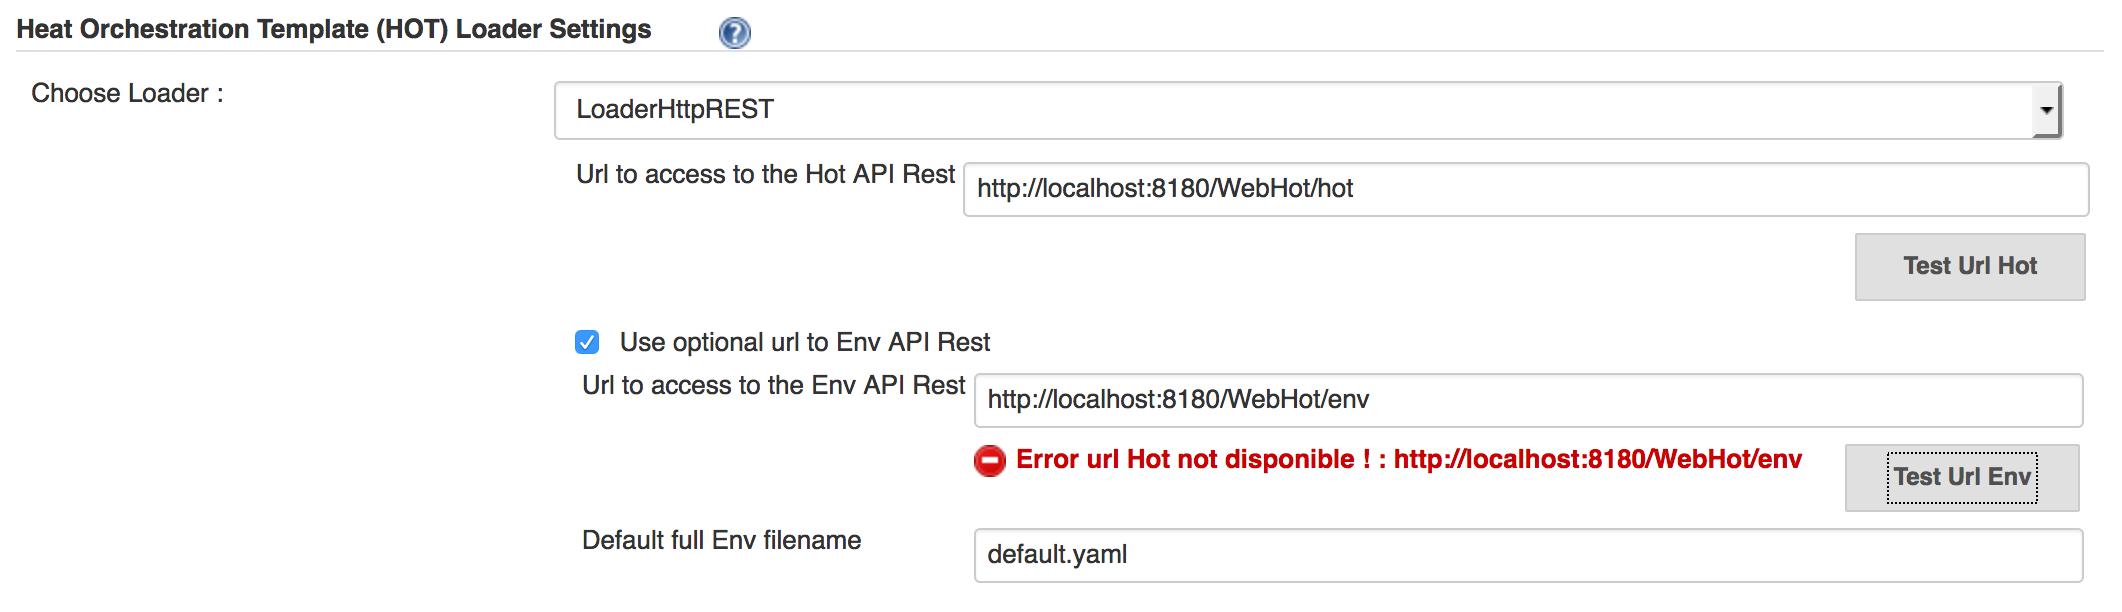 Openstack Heat Plugin Jenkins Jenkins Wiki - Openstack heat template